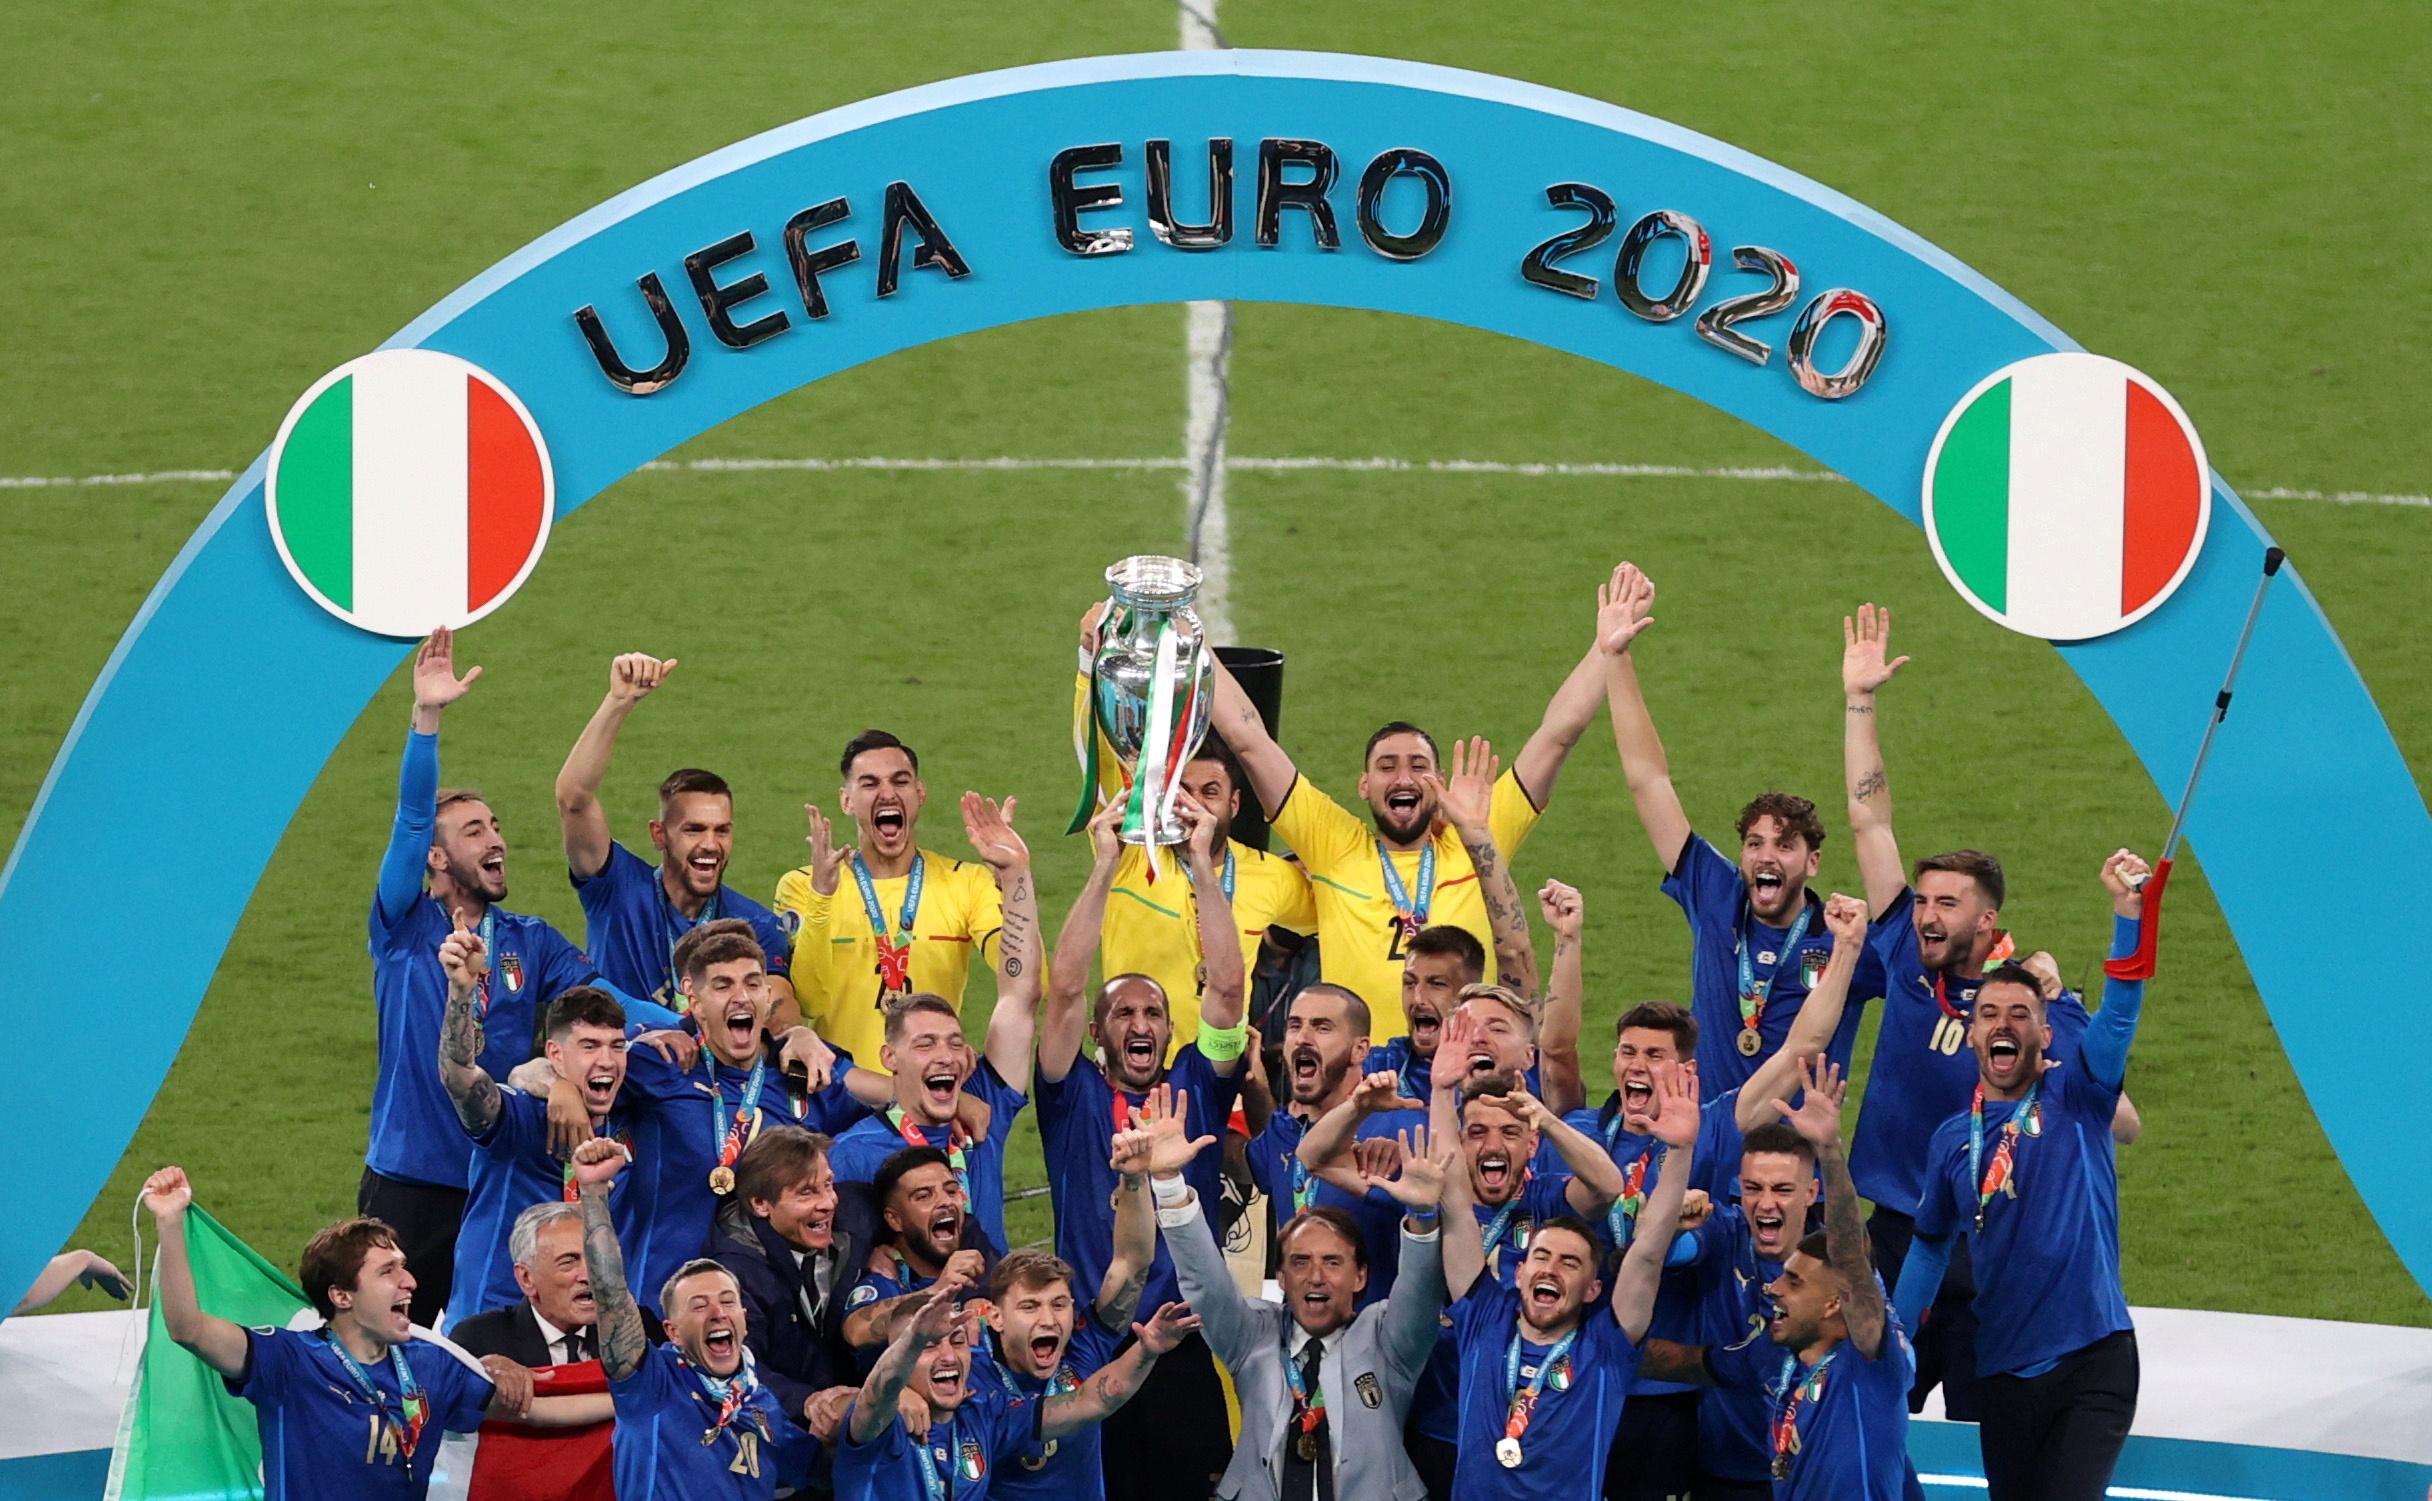 Euro 2020: Πανηγυρικά πρωτοσέλιδα στην Ιταλία – «Η Ευρώπη είμαστε εμείς»